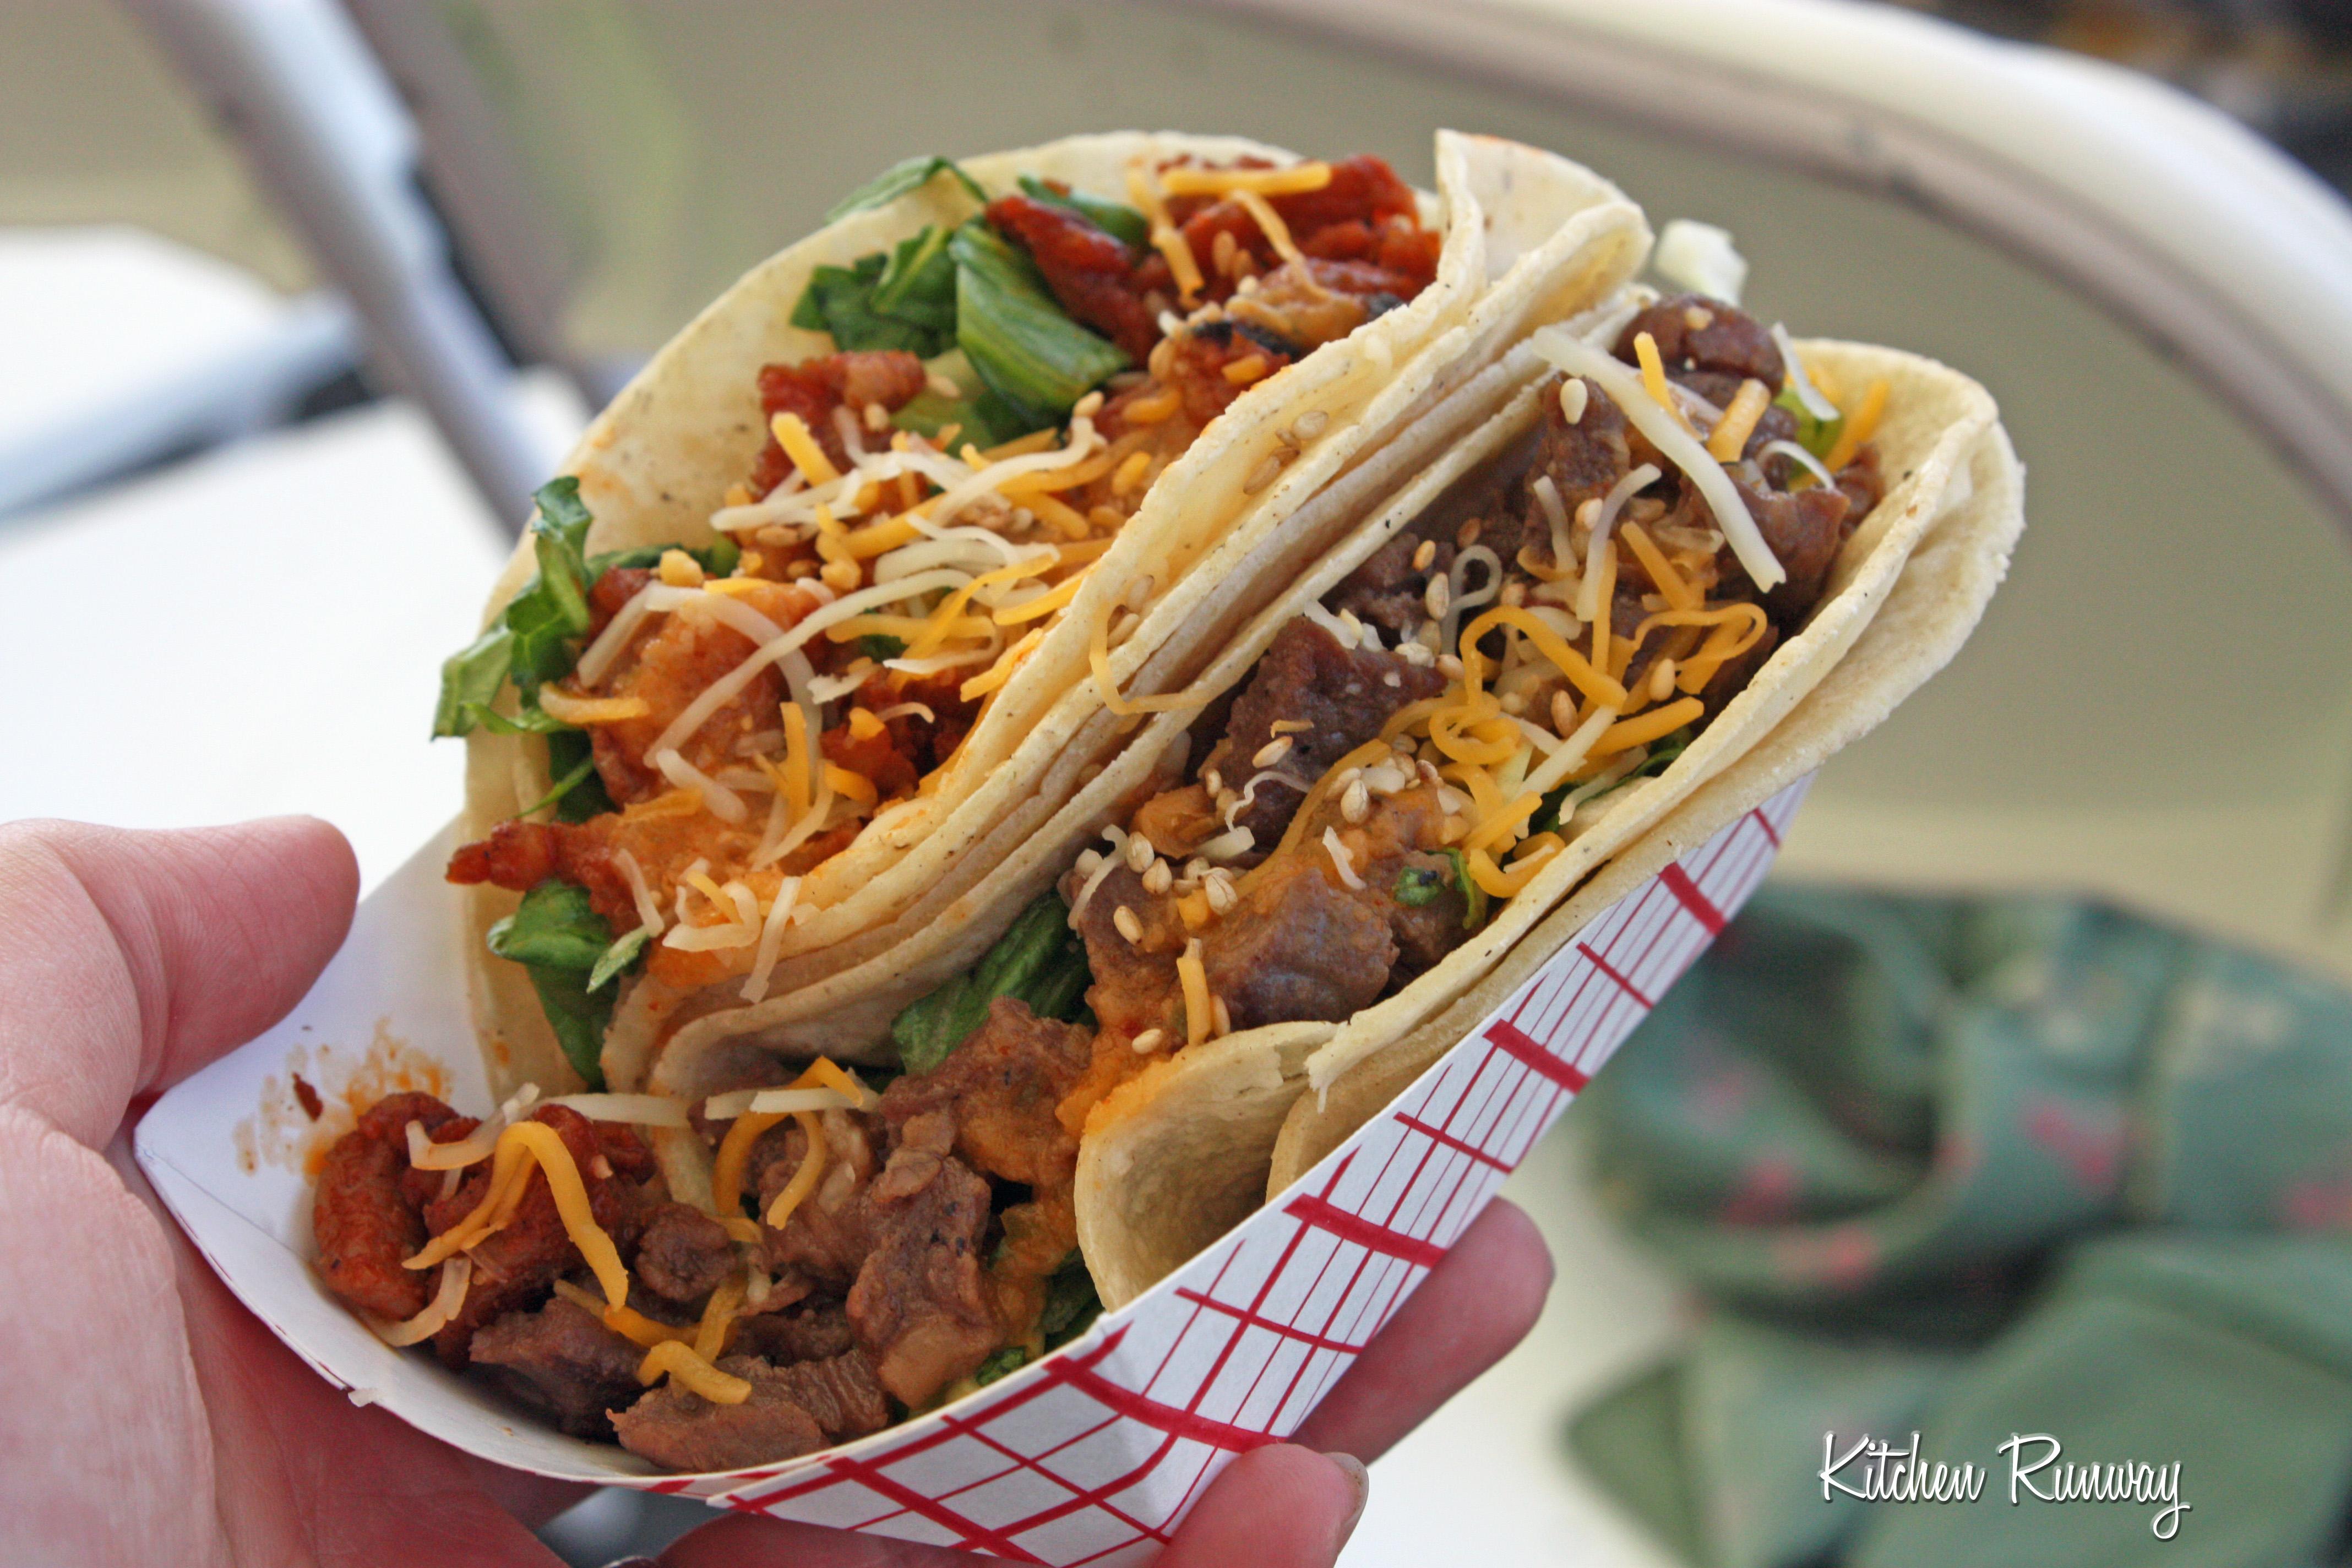 pork & beef taco calbi truck